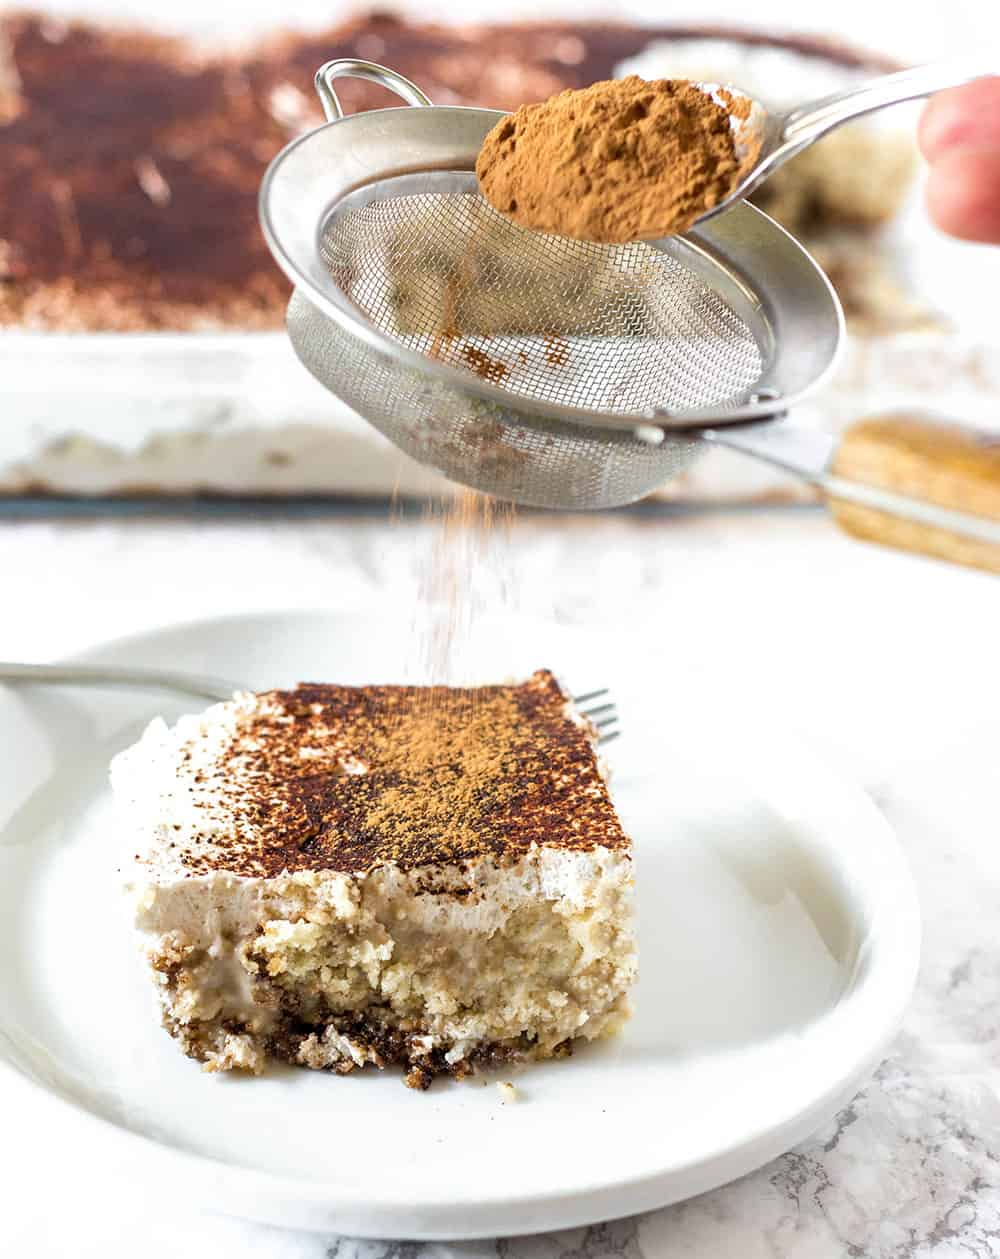 Tiramisu Cake Dusting With Carob Powder